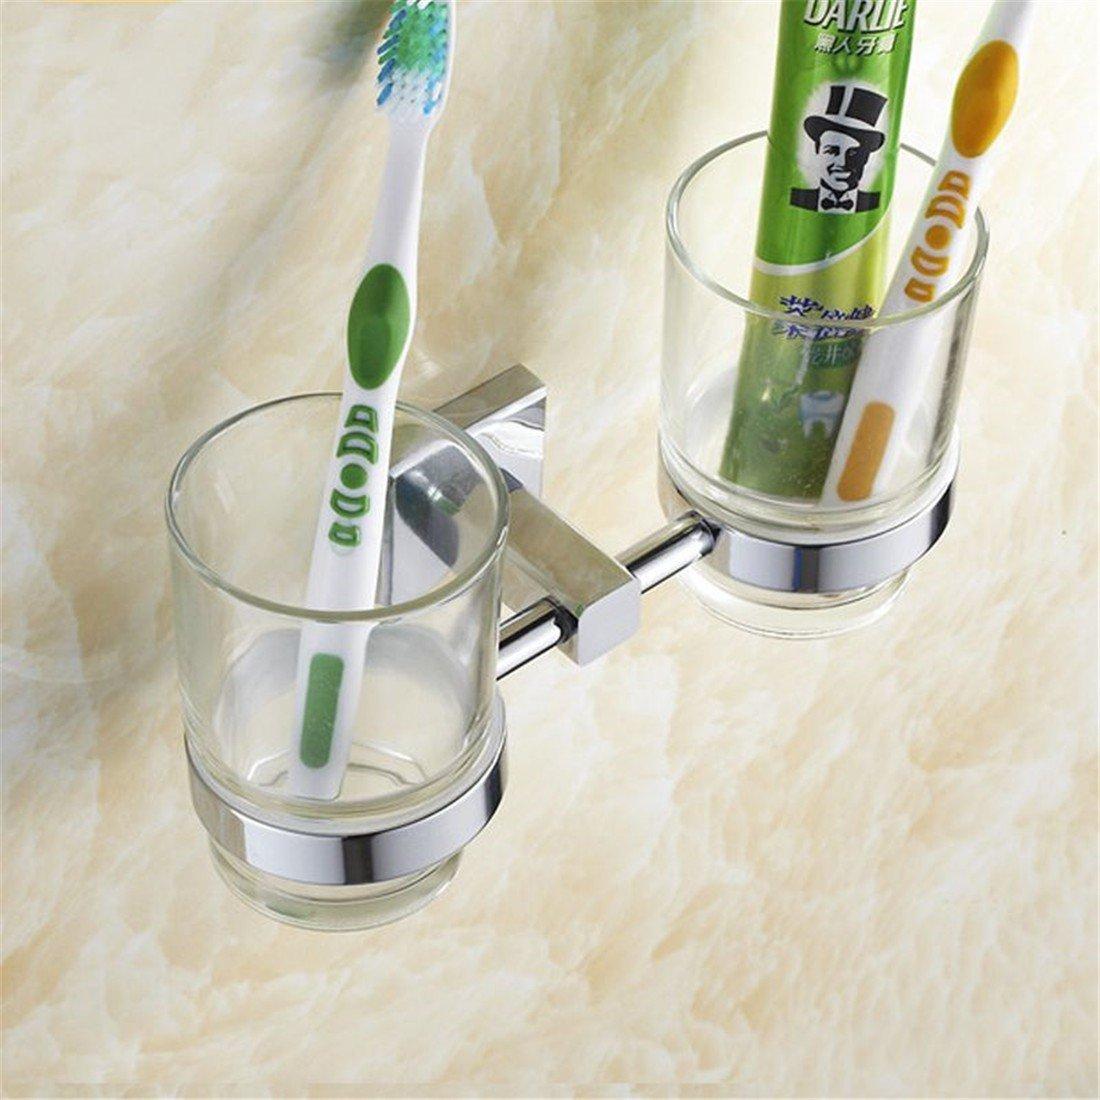 LAONA A contemporary minimalist Brass chrome bathroom accessory kit bath towel rack Towel racks, Dual Cup